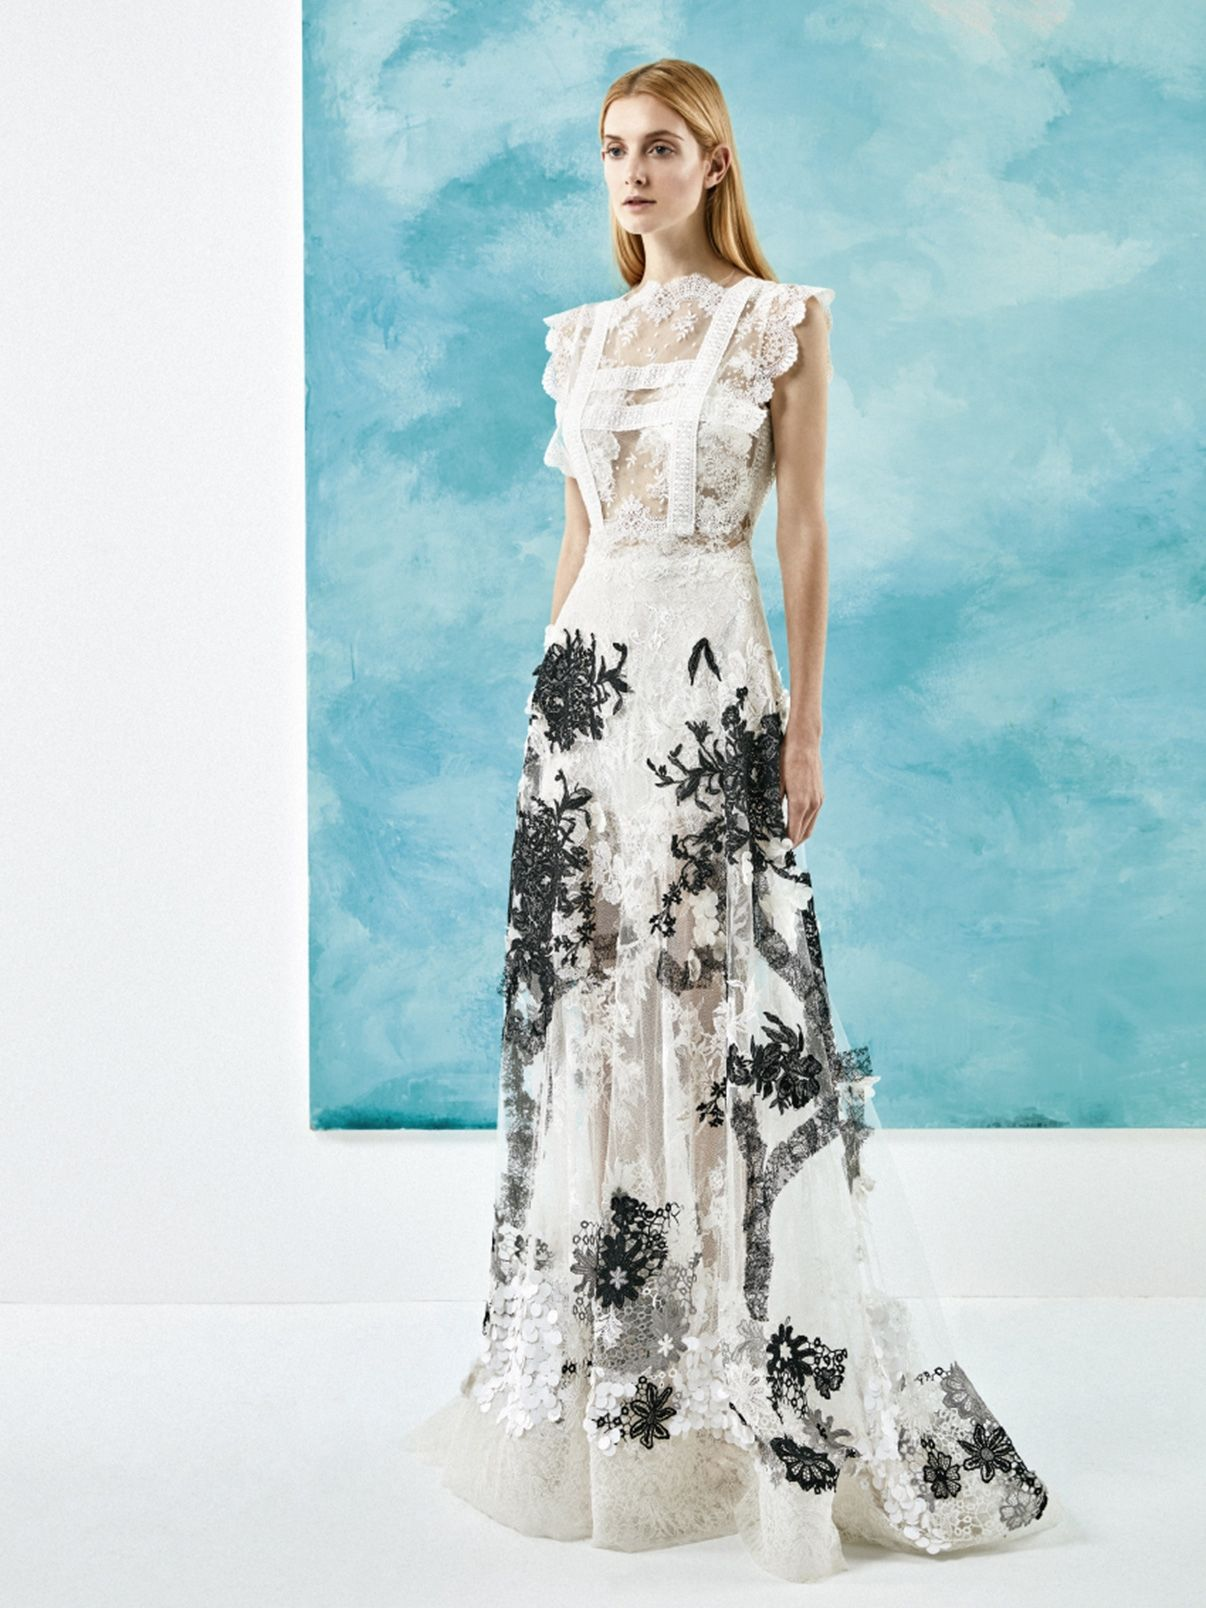 Stunning Vestidos Novia Segunda Mano Valencia Images - Wedding Ideas ...